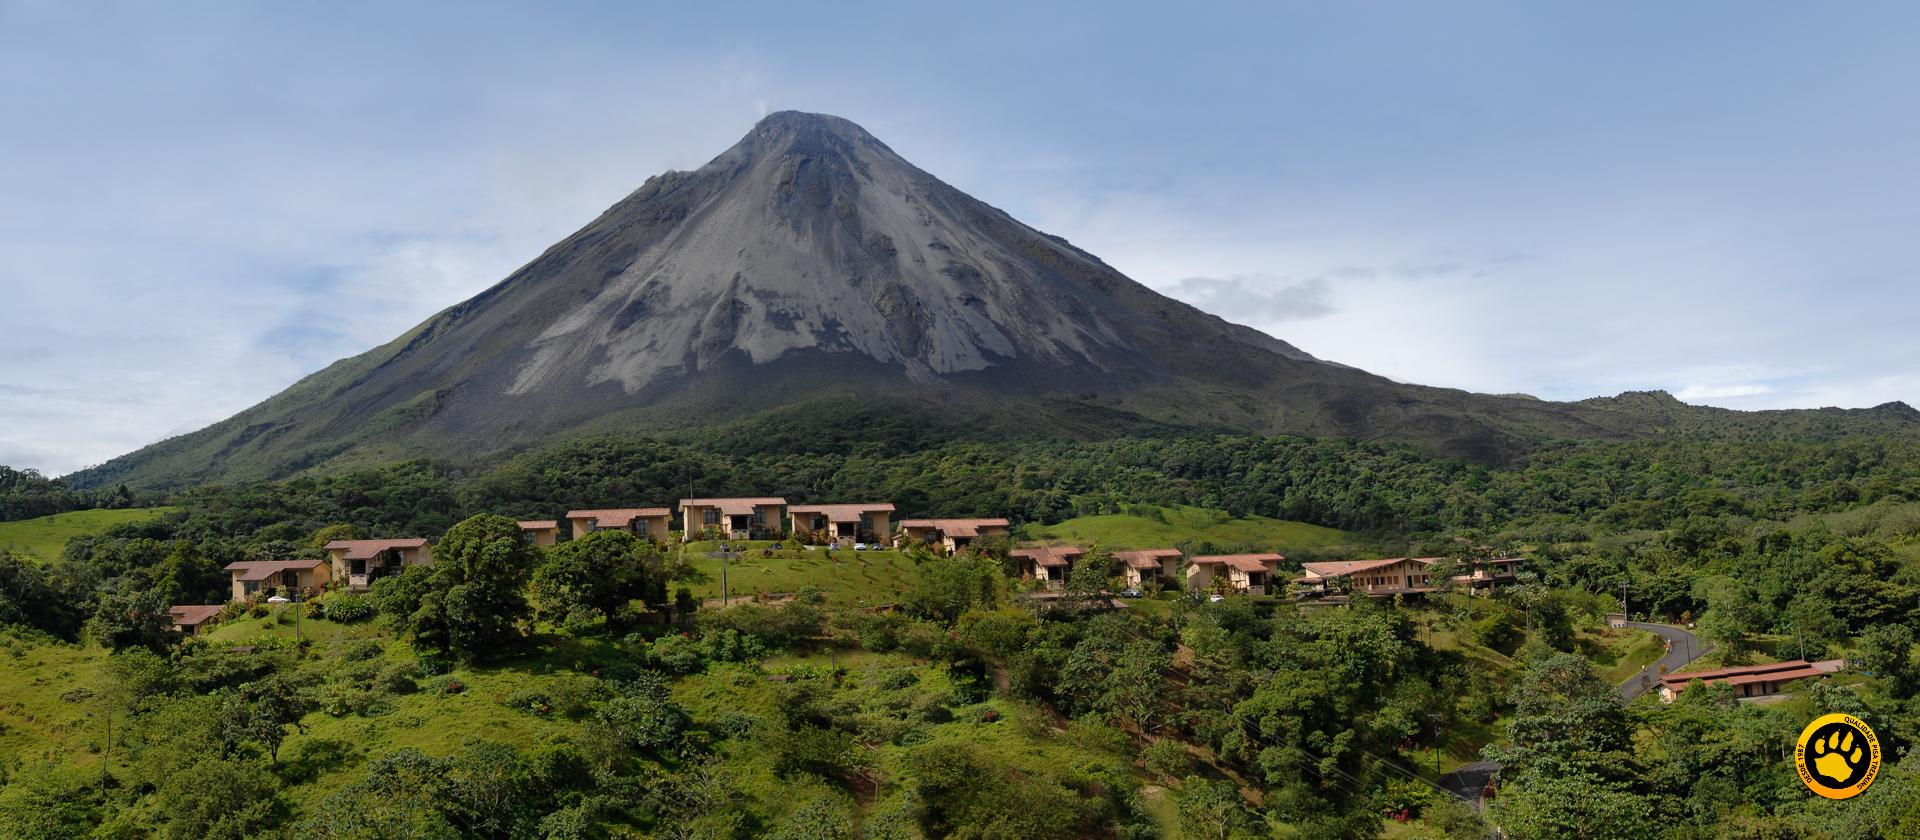 Tudo sobre a Costa Rica